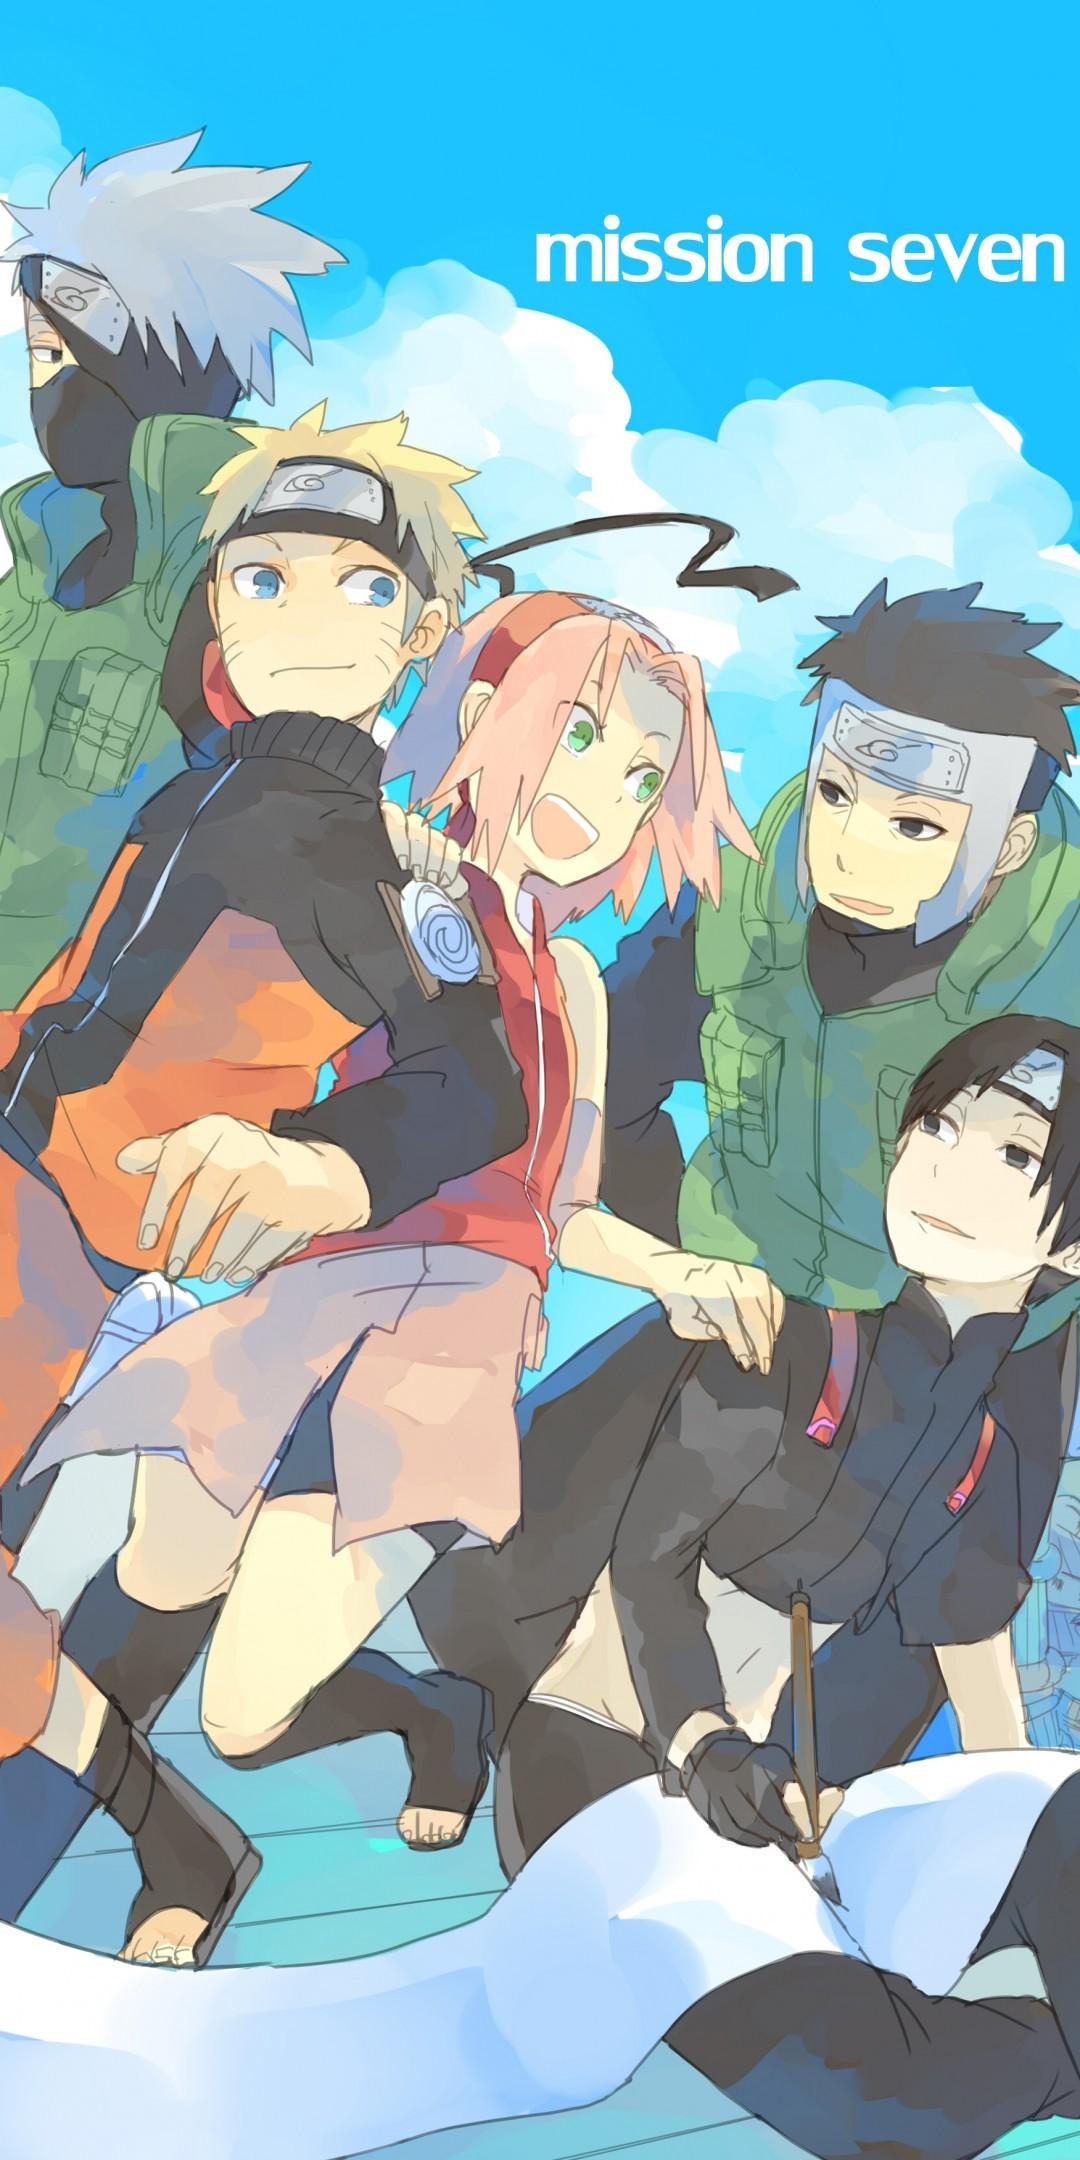 Iphone Sai Naruto Wallpaper Hd - HD Wallpaper